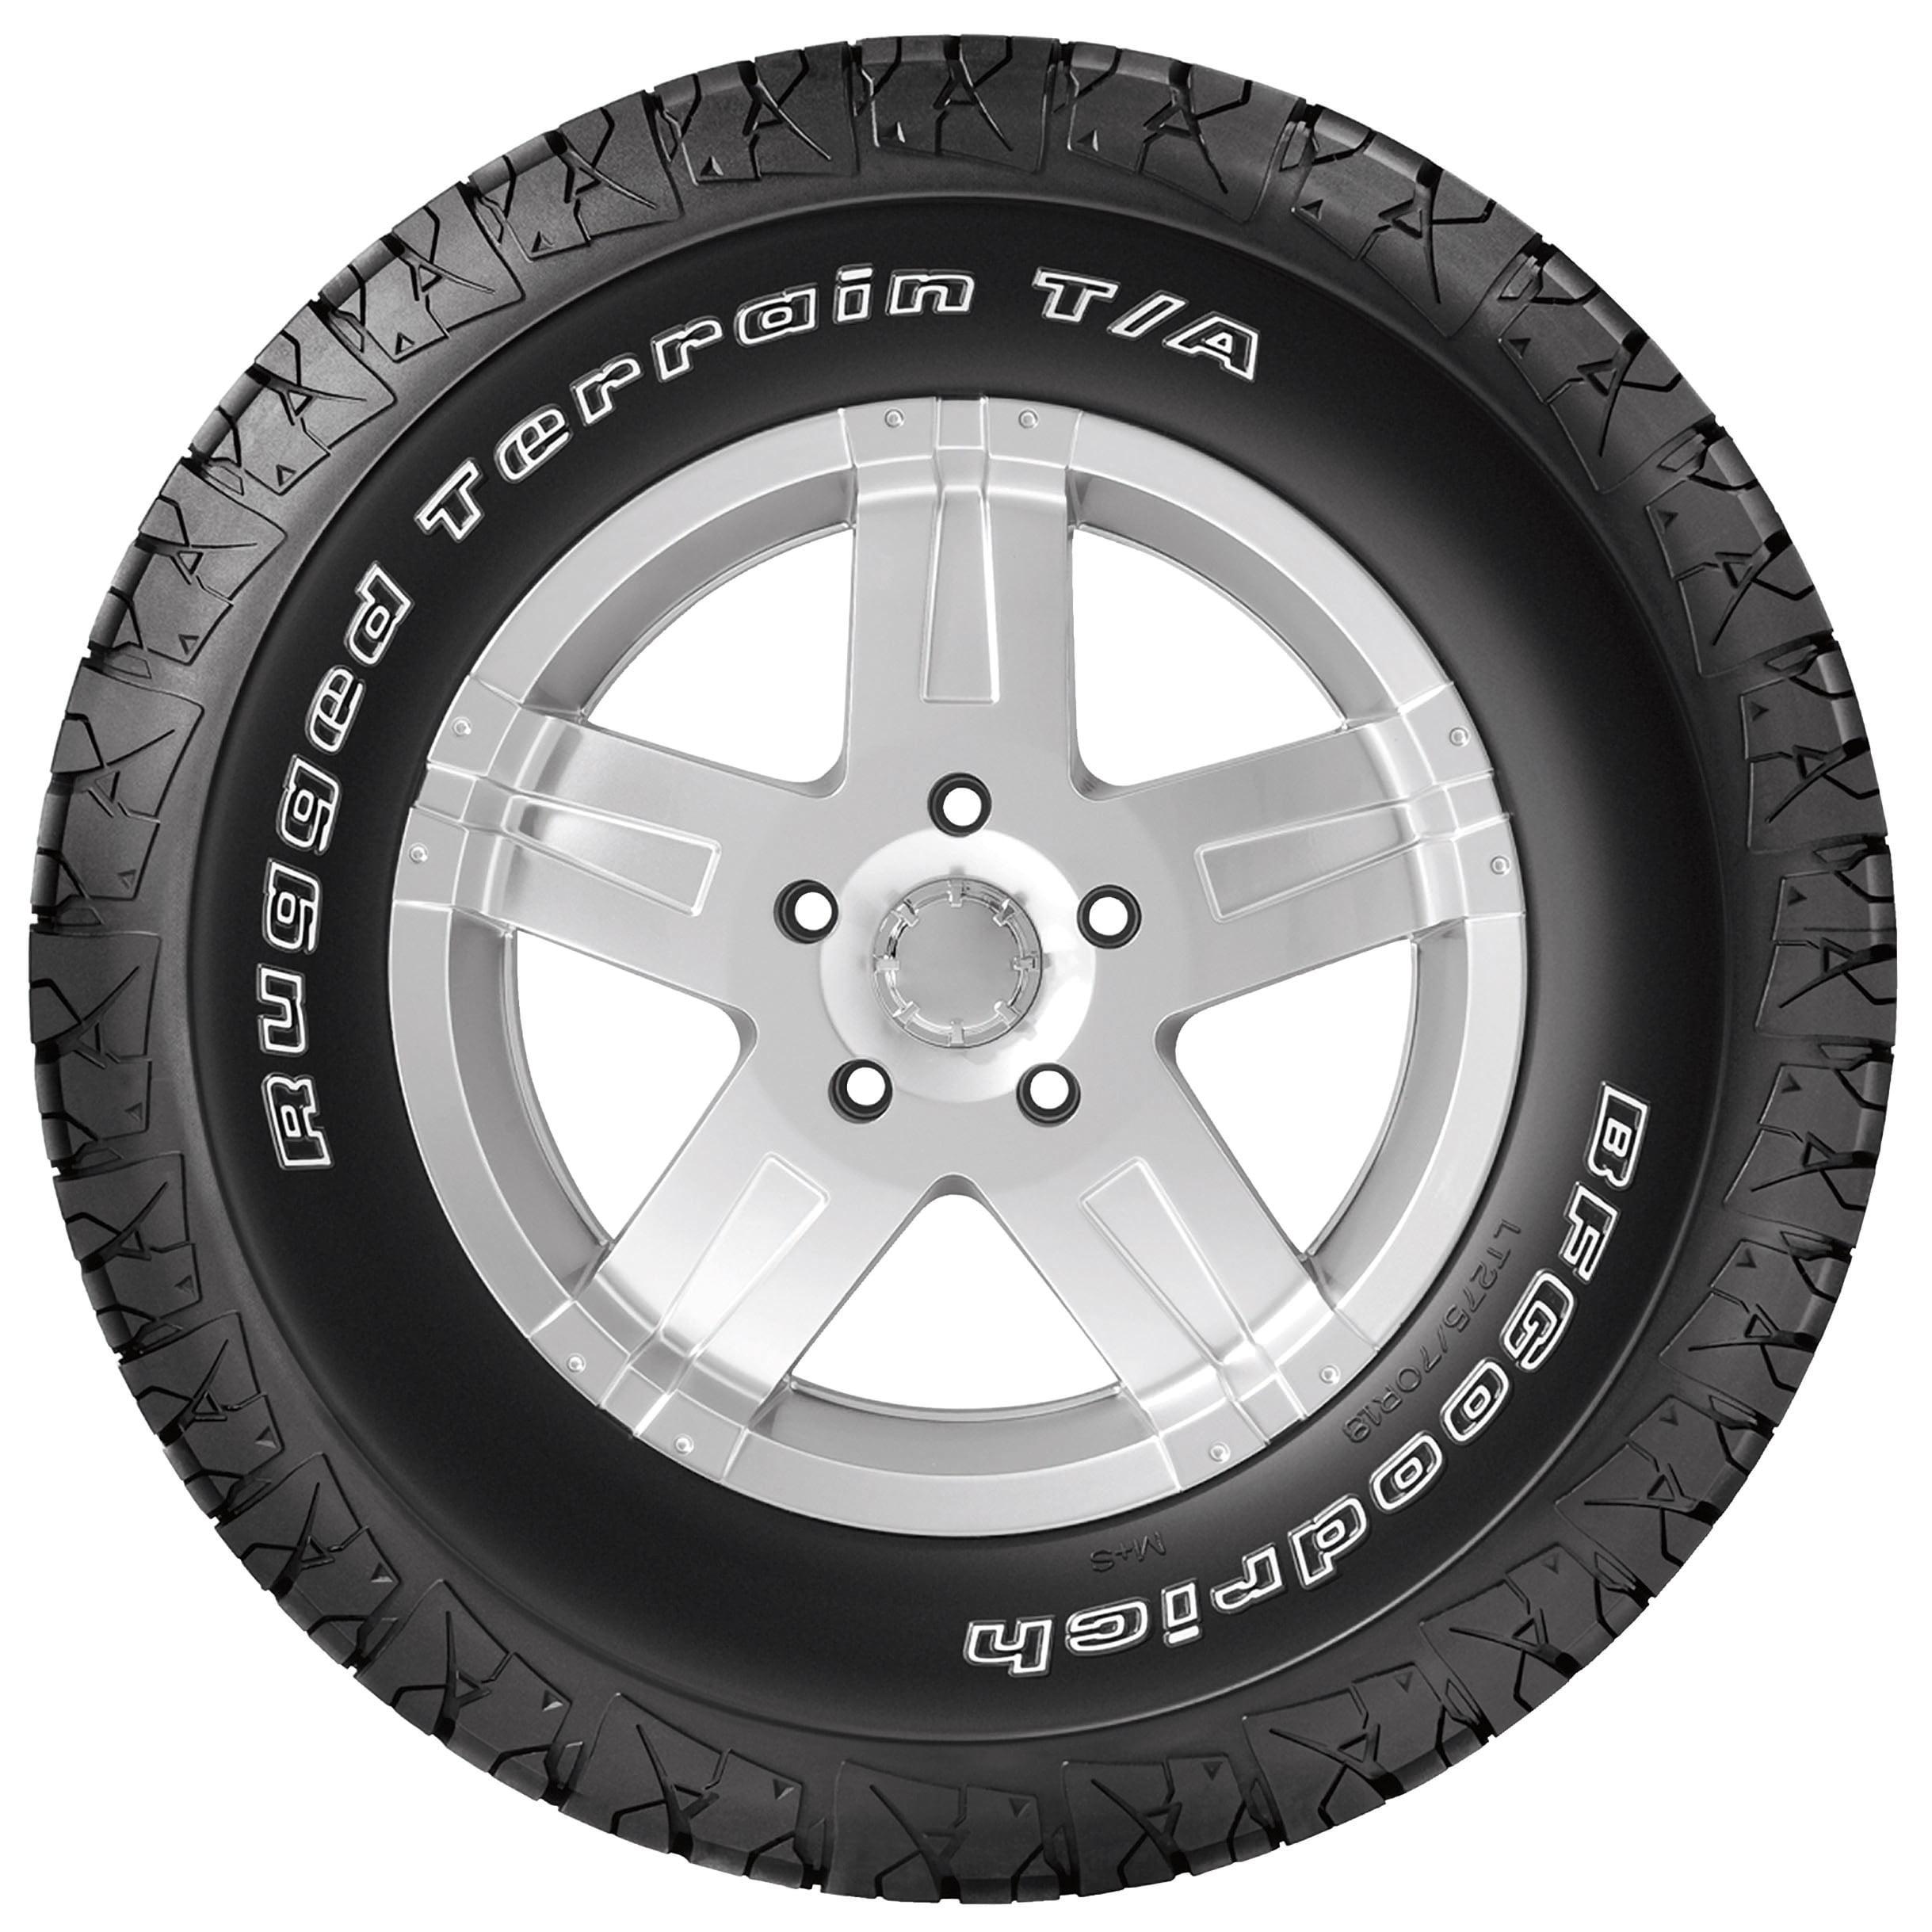 Dodge Sportsman Rv Wiring Diagram Database 1974 Motorhome Bfgoodrich Rugged Terrain T A Tire P235 75r15 Xl 108t Walmart 1979